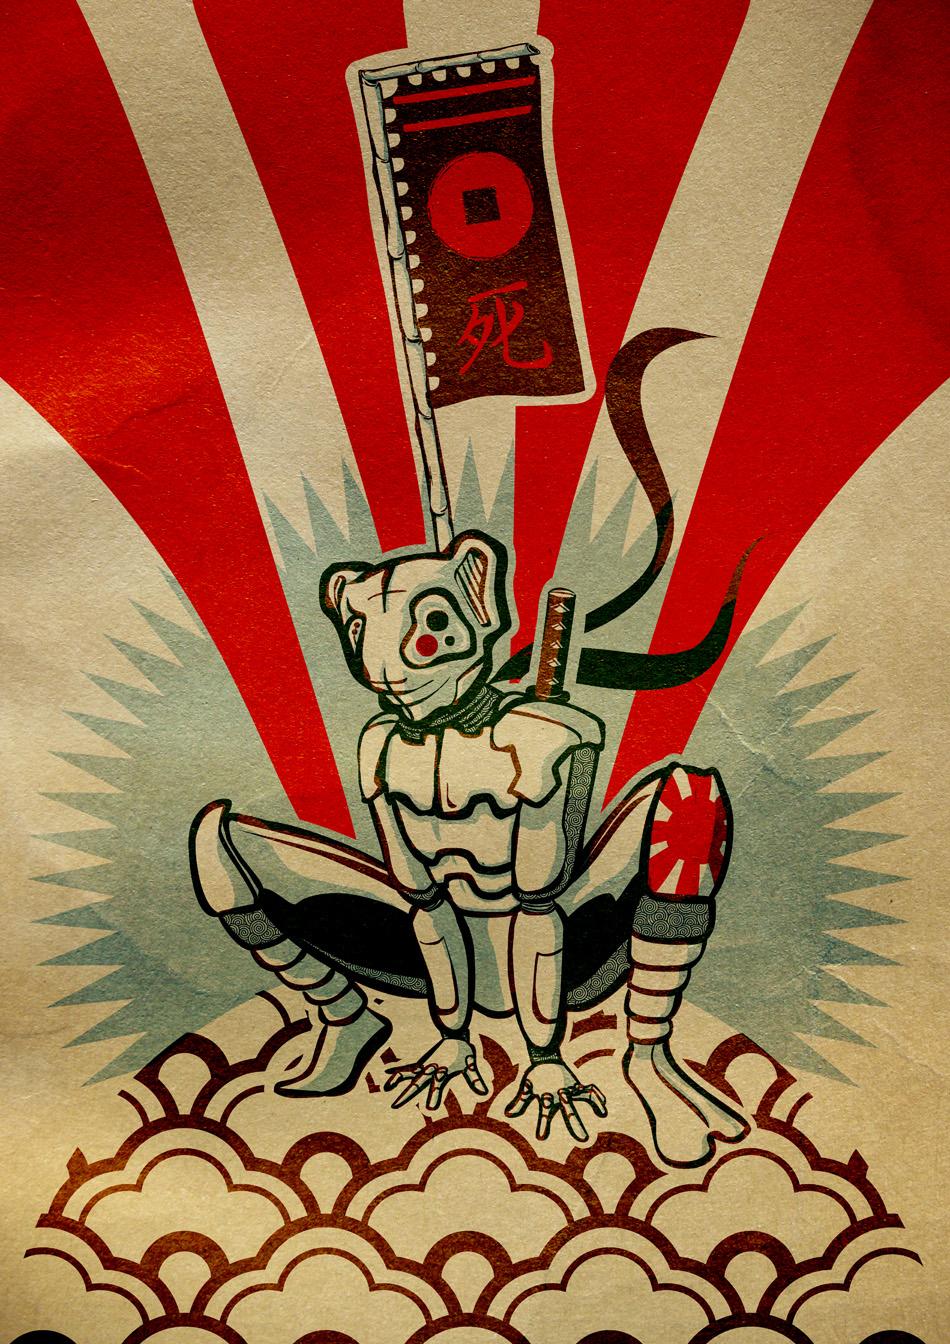 Mecha Samurai Robo Bear character illustration